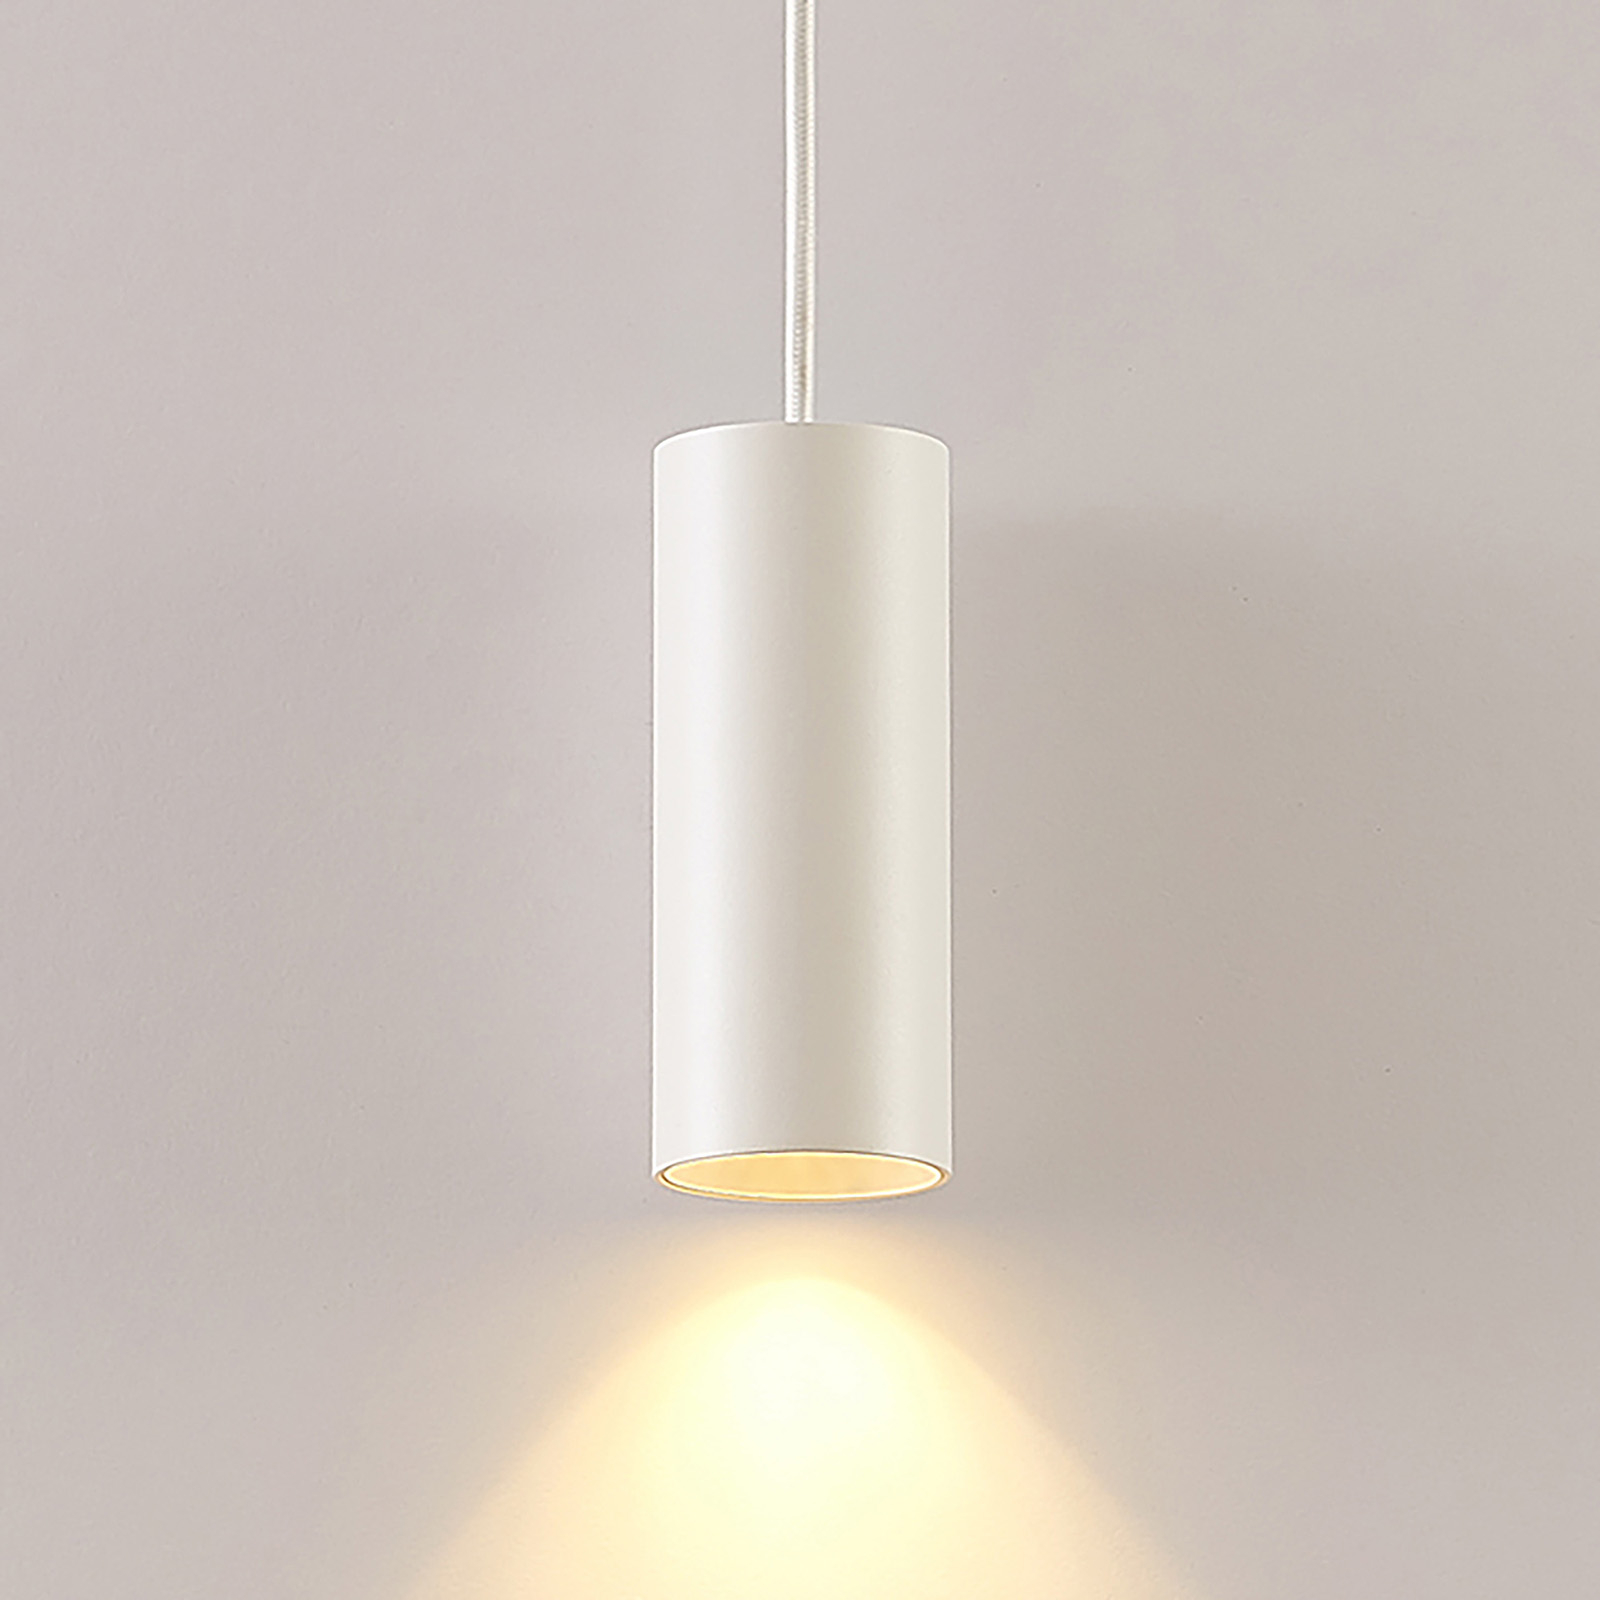 Arcchio Ejona Pendellampe, Höhe 15 cm, weiß